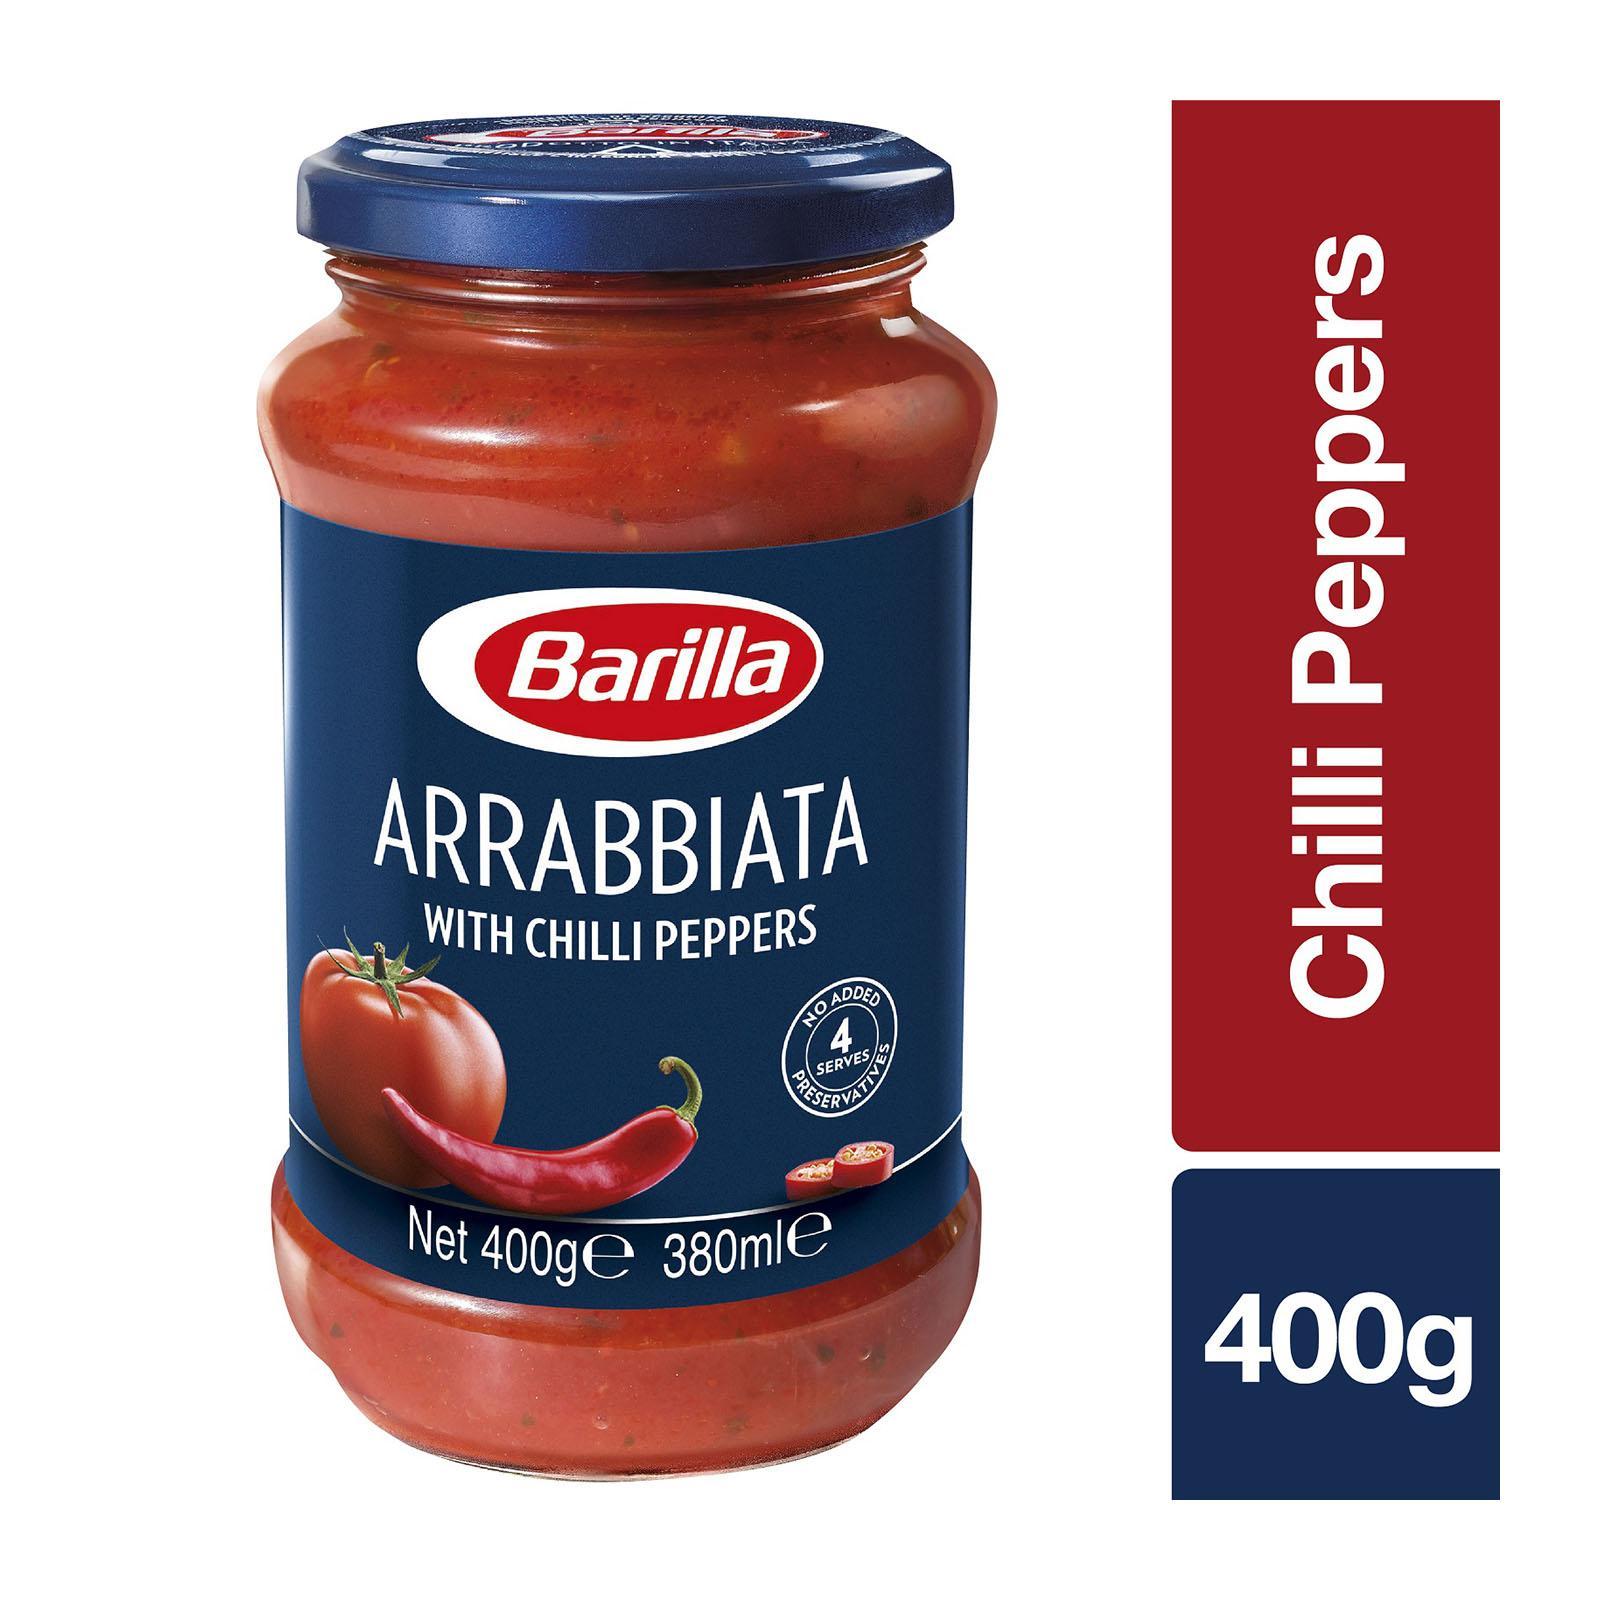 Barilla Pasta Sauce - Arrabbiata